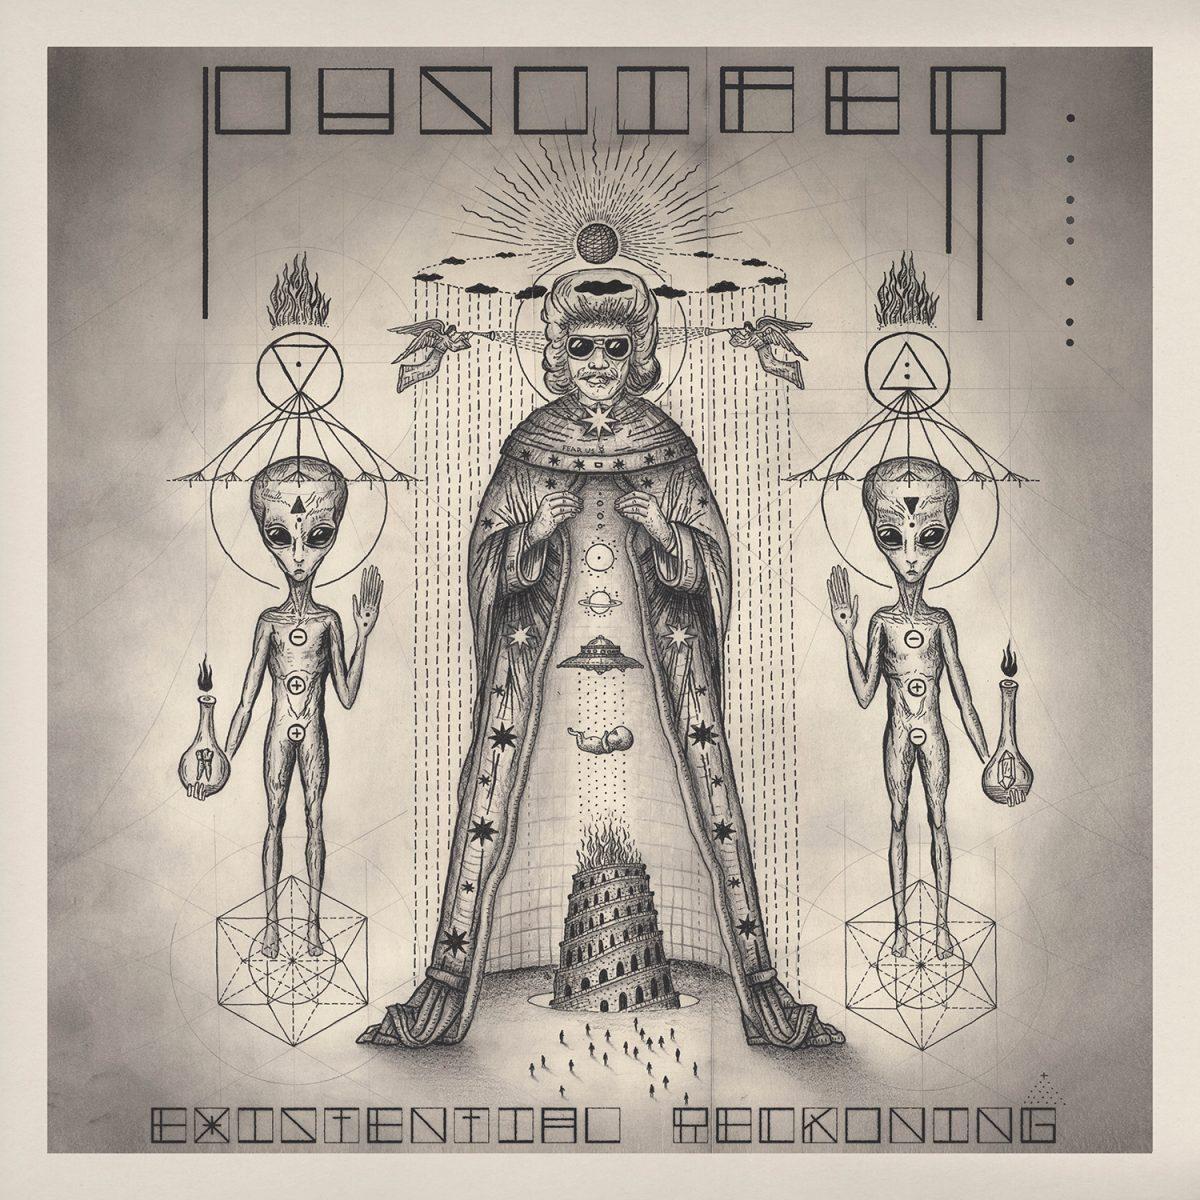 puscifer-existential-reckoning-album-review